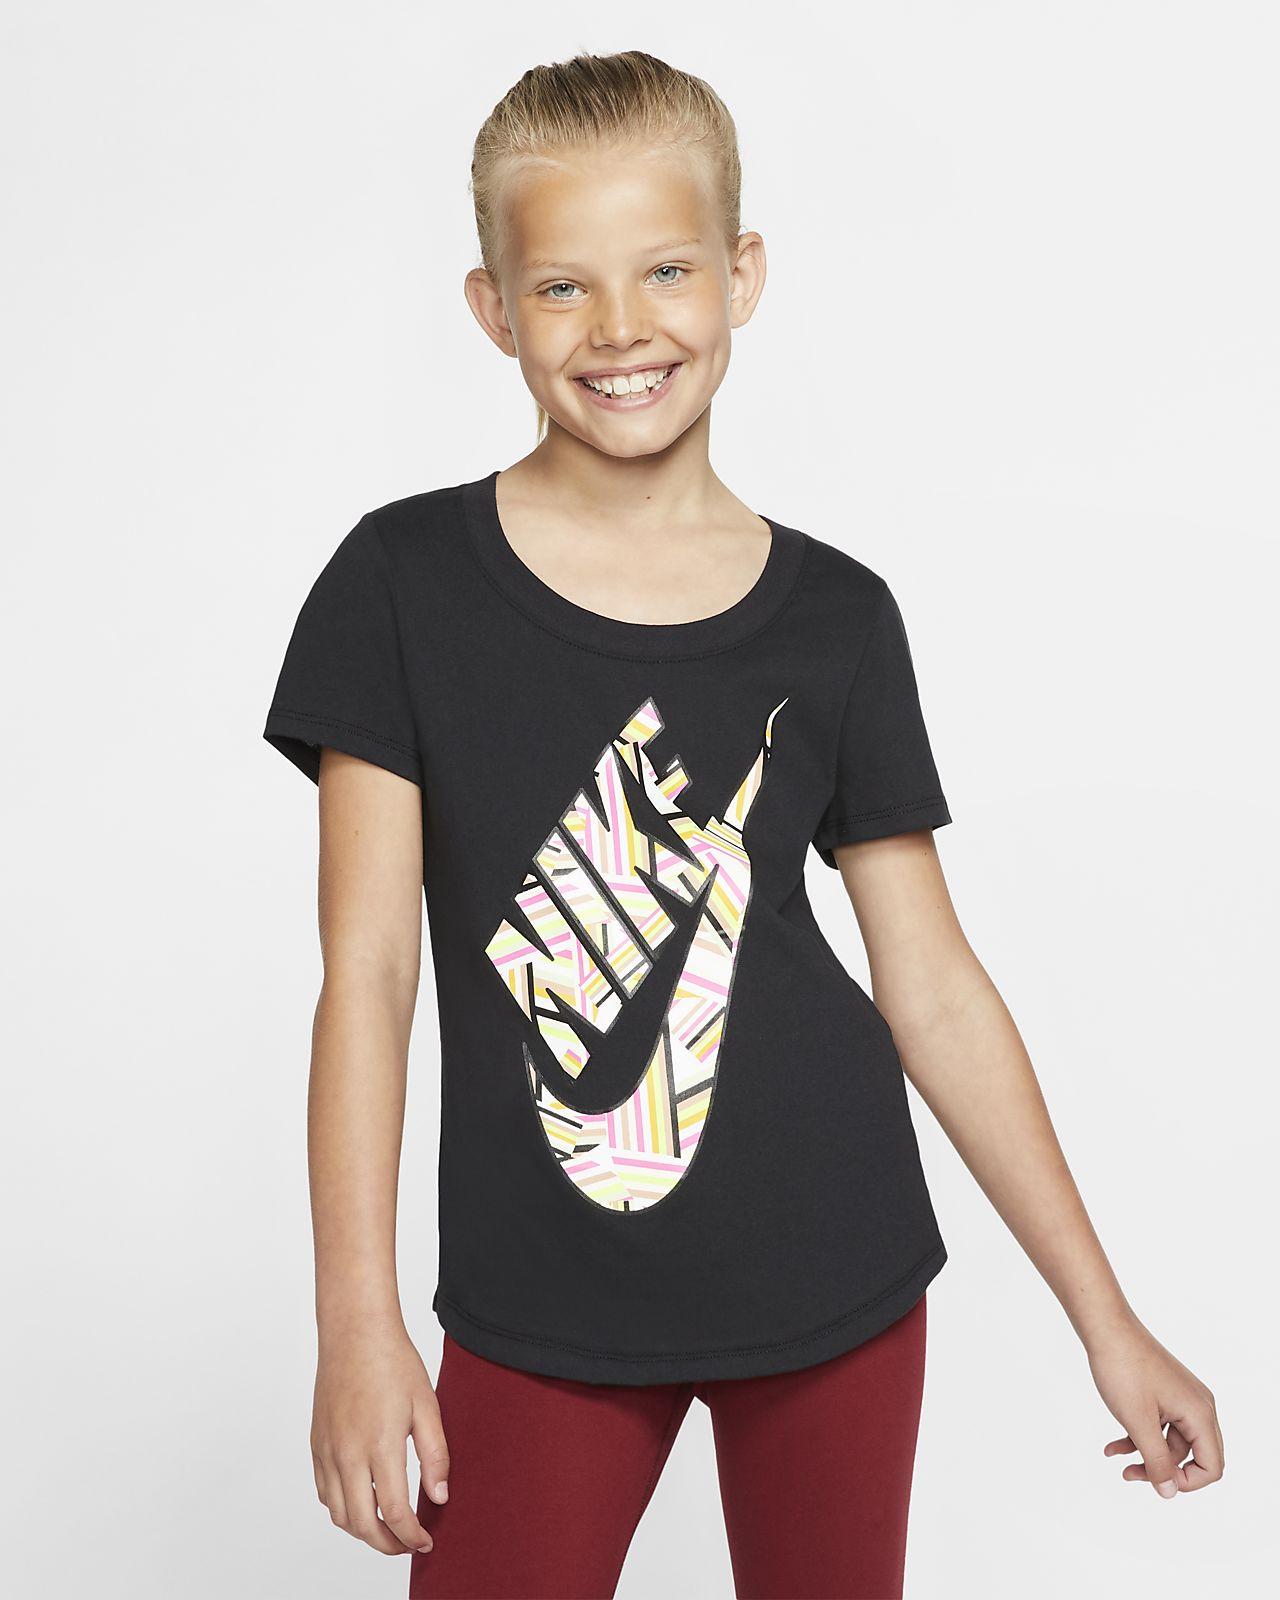 Nike Dri-FIT Trainings-T-Shirt für ältere Kinder (Mädchen)